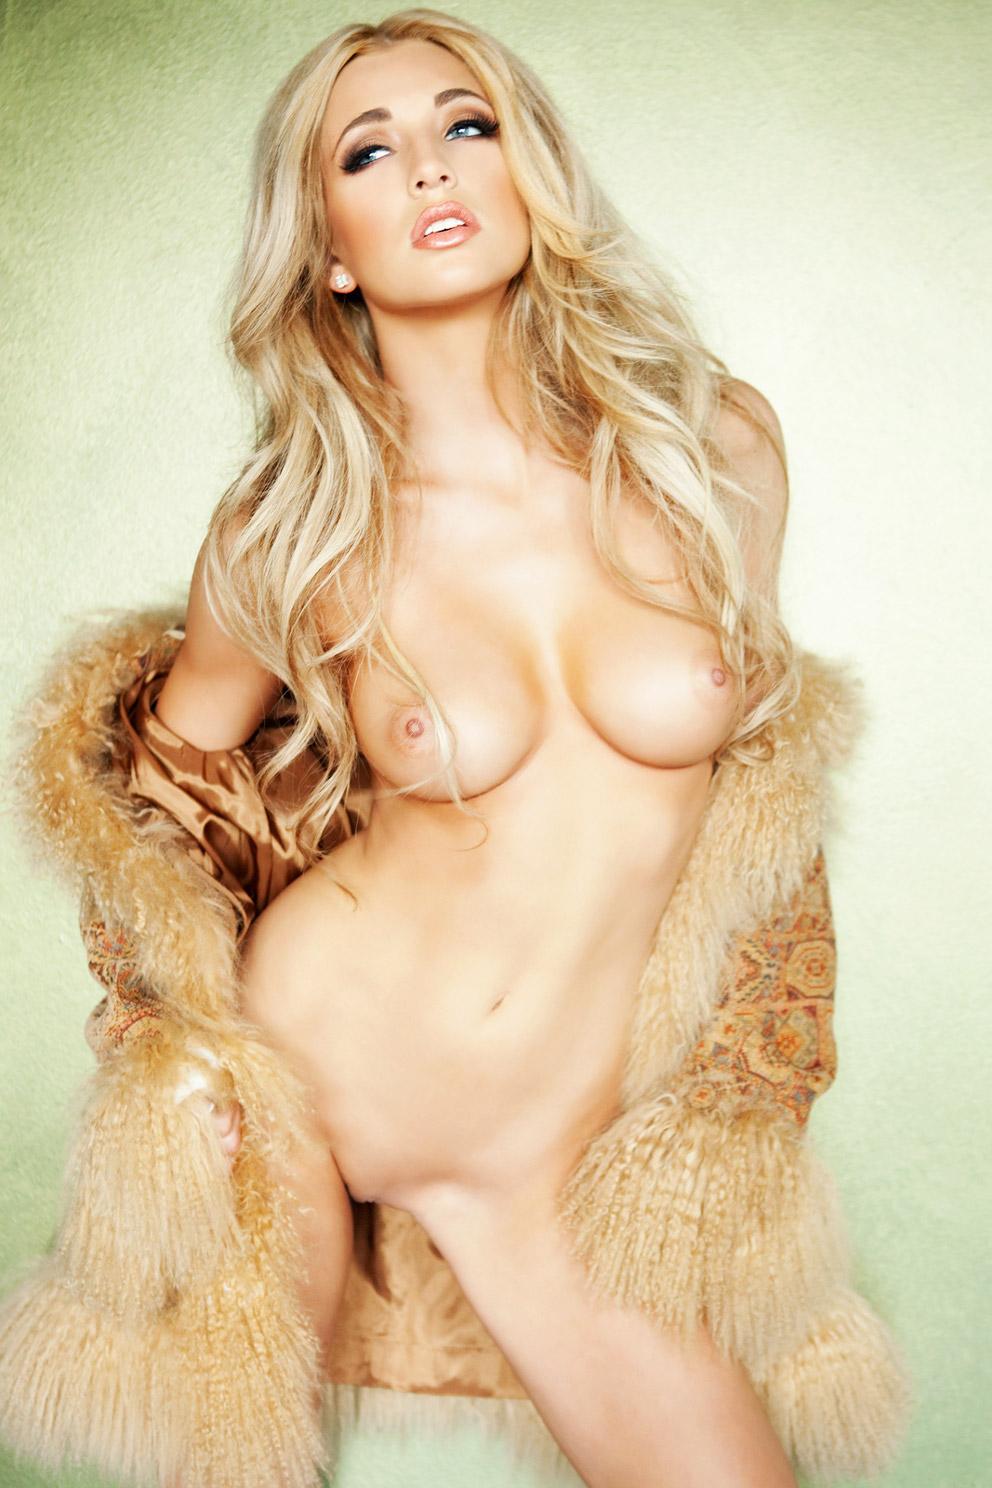 Russian porn actresses